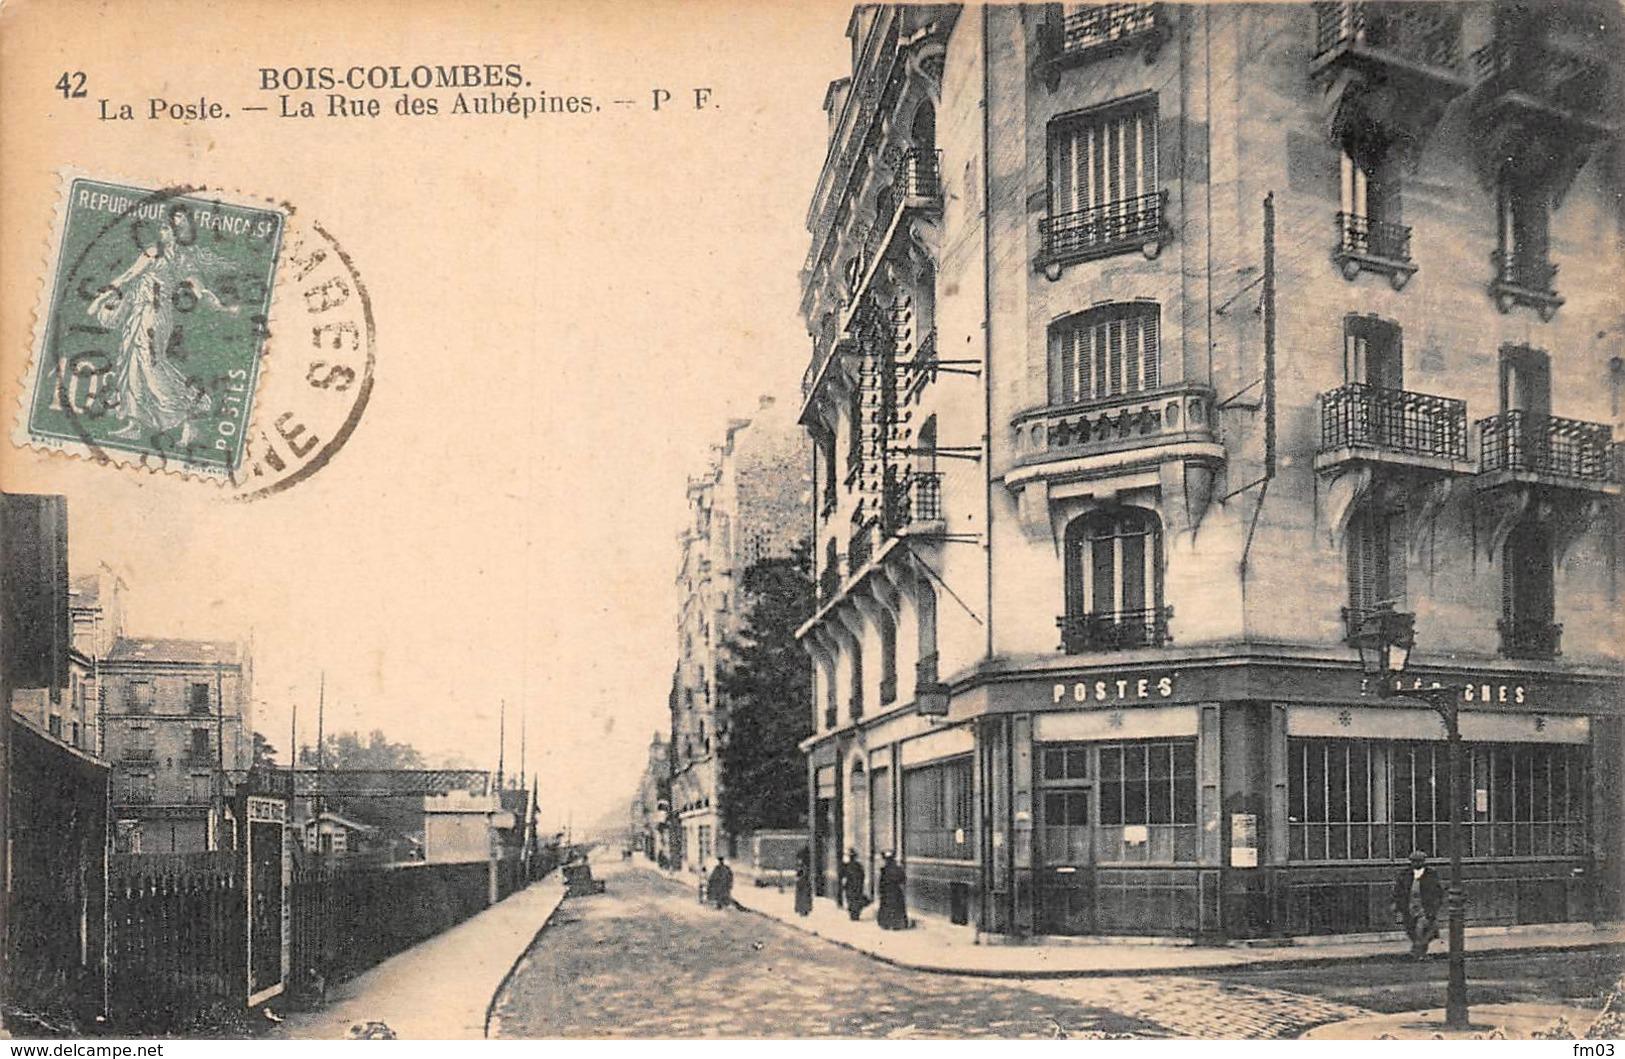 Bois Colombes Poste Postes - France